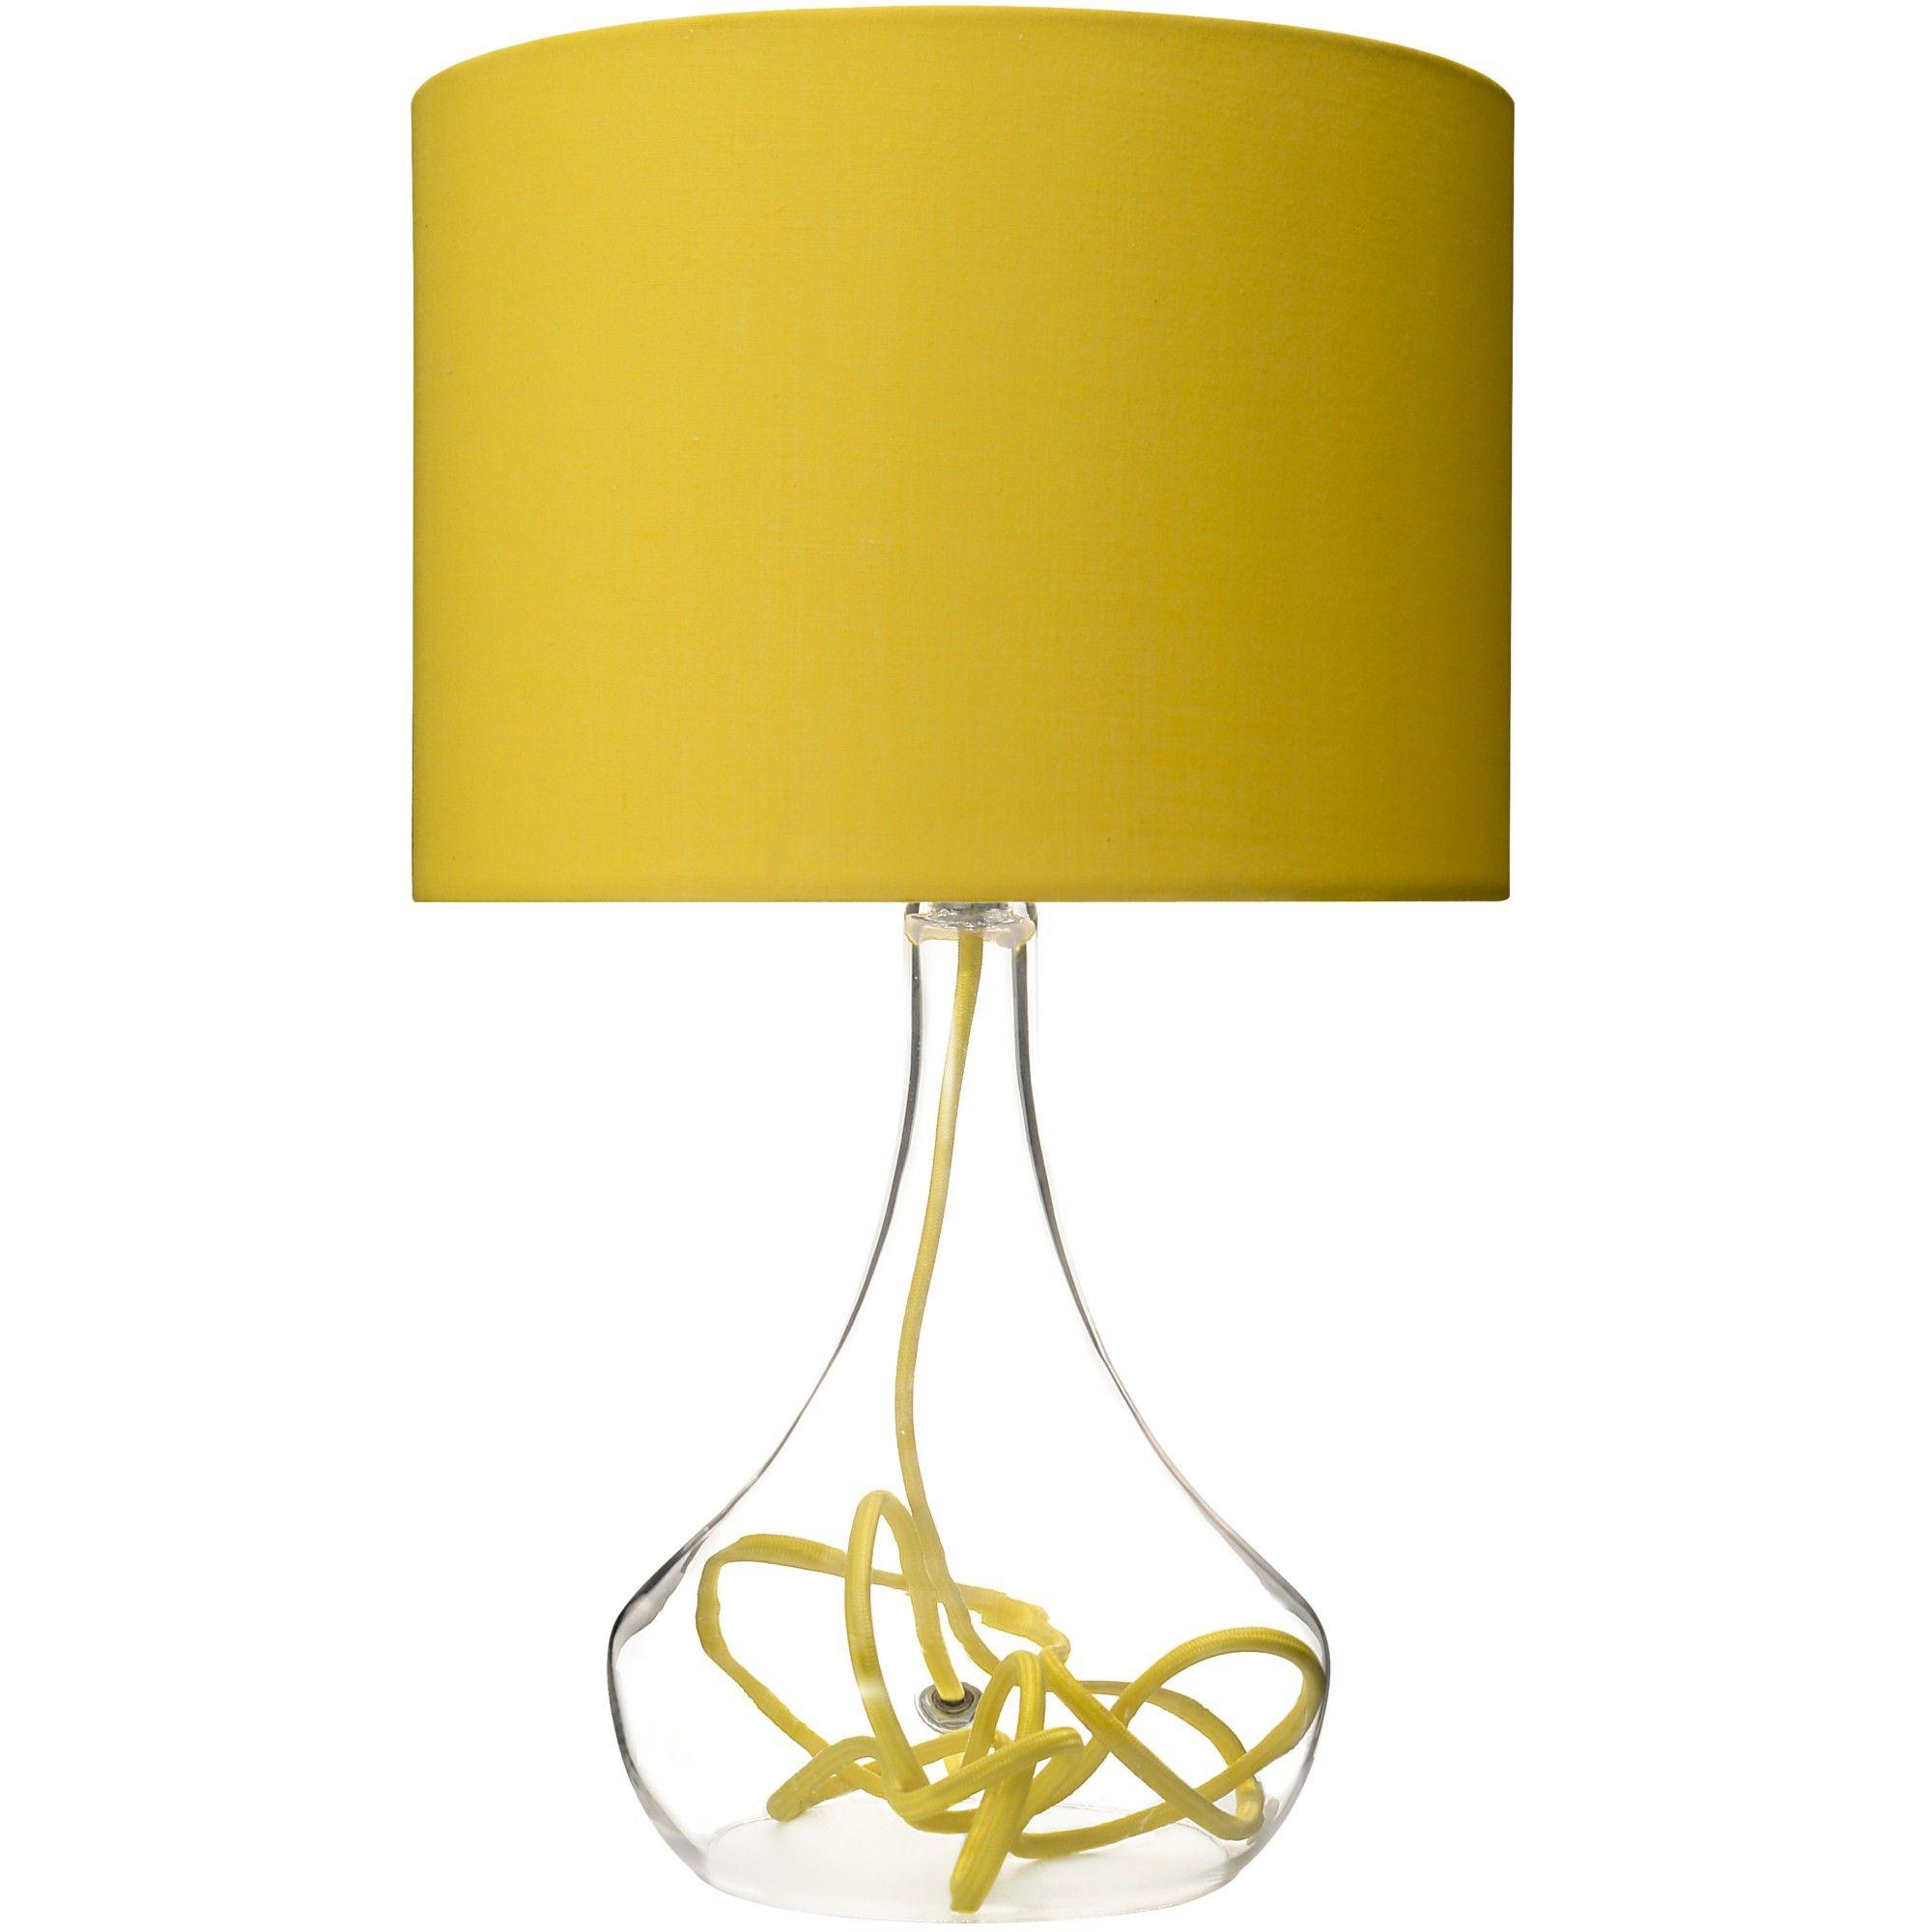 Jolie table lamp light pinterest john lewis bedrooms jolie table lamp john lewistable lamps geotapseo Image collections